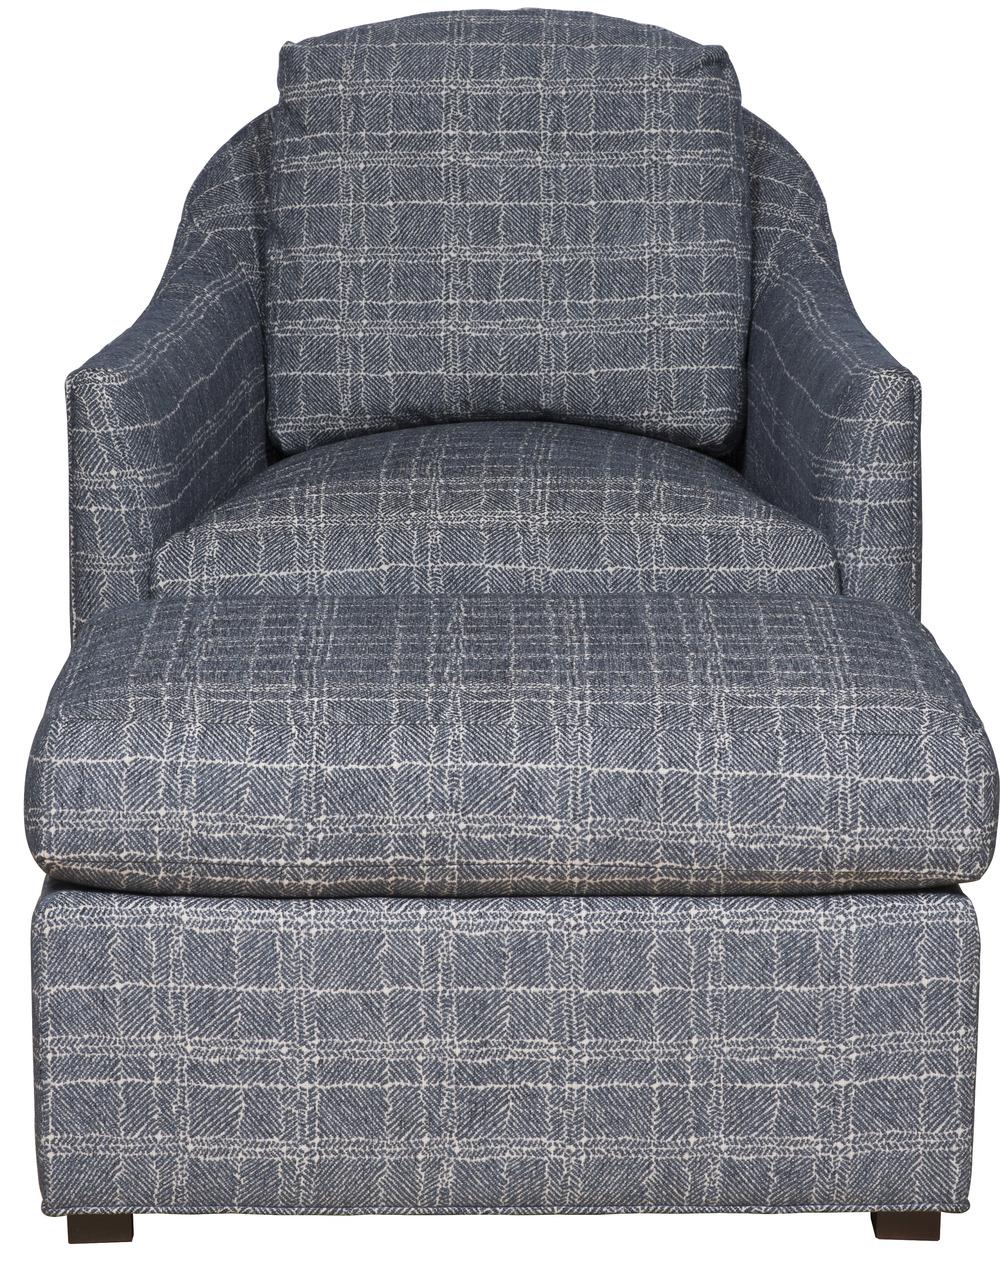 Vanguard Furniture - Ferrin Swivel Chair and Ottoman